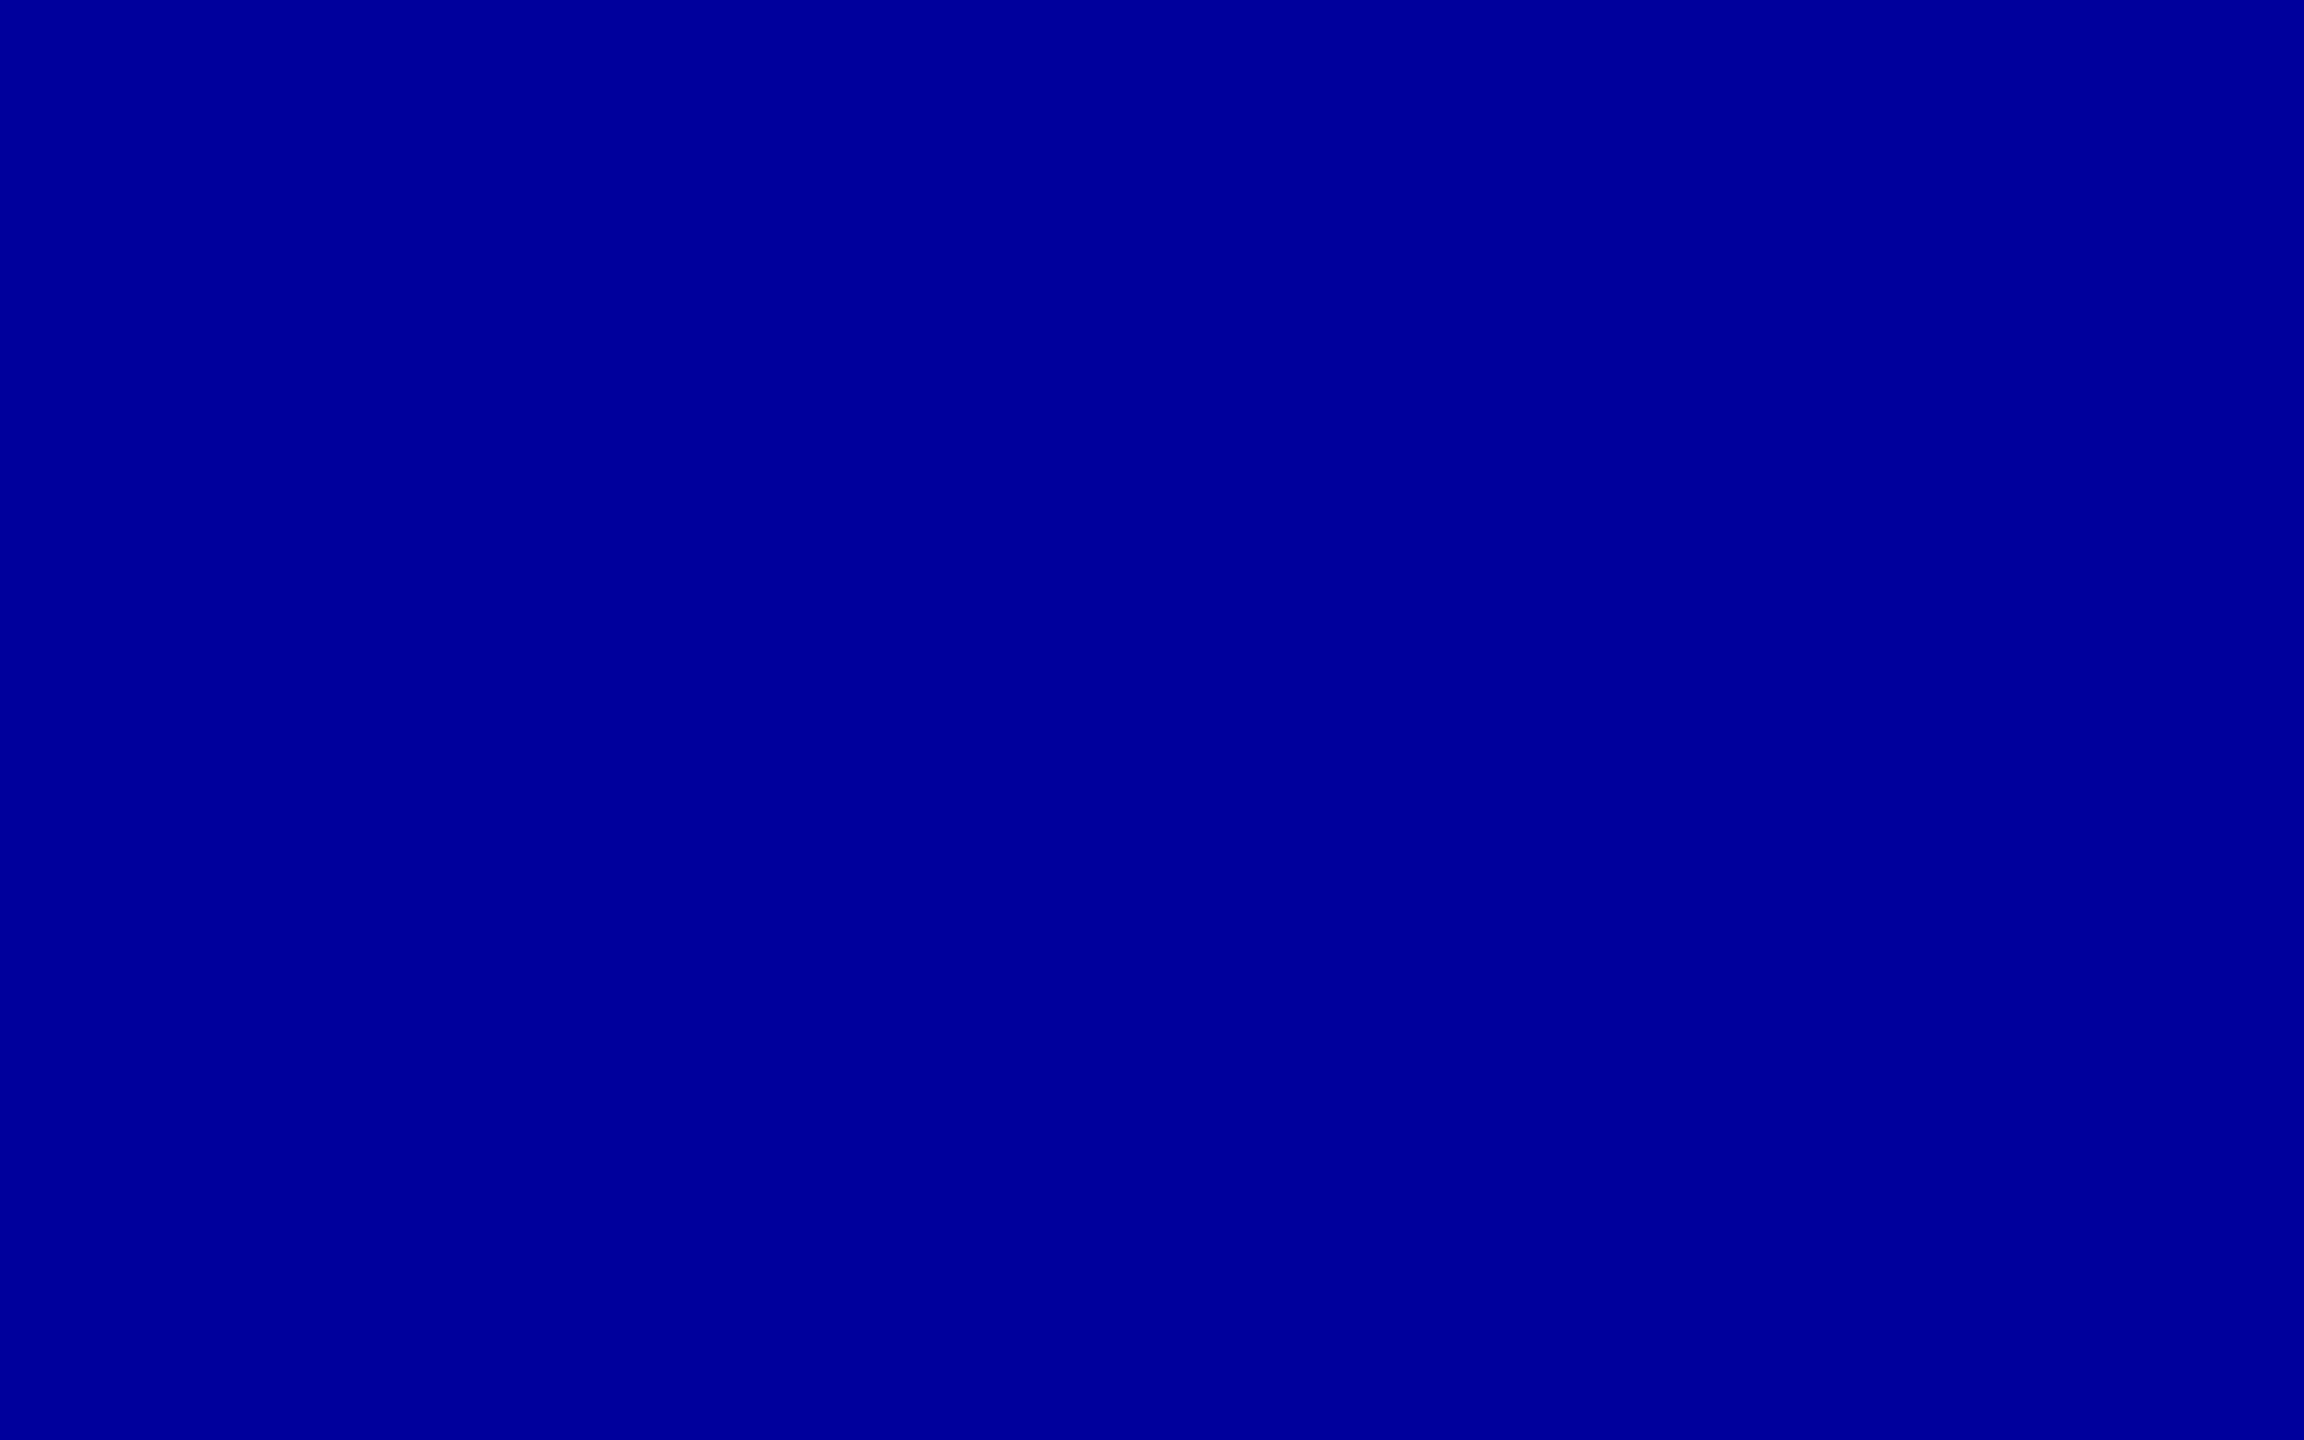 2304x1440 Duke Blue Solid Color Background